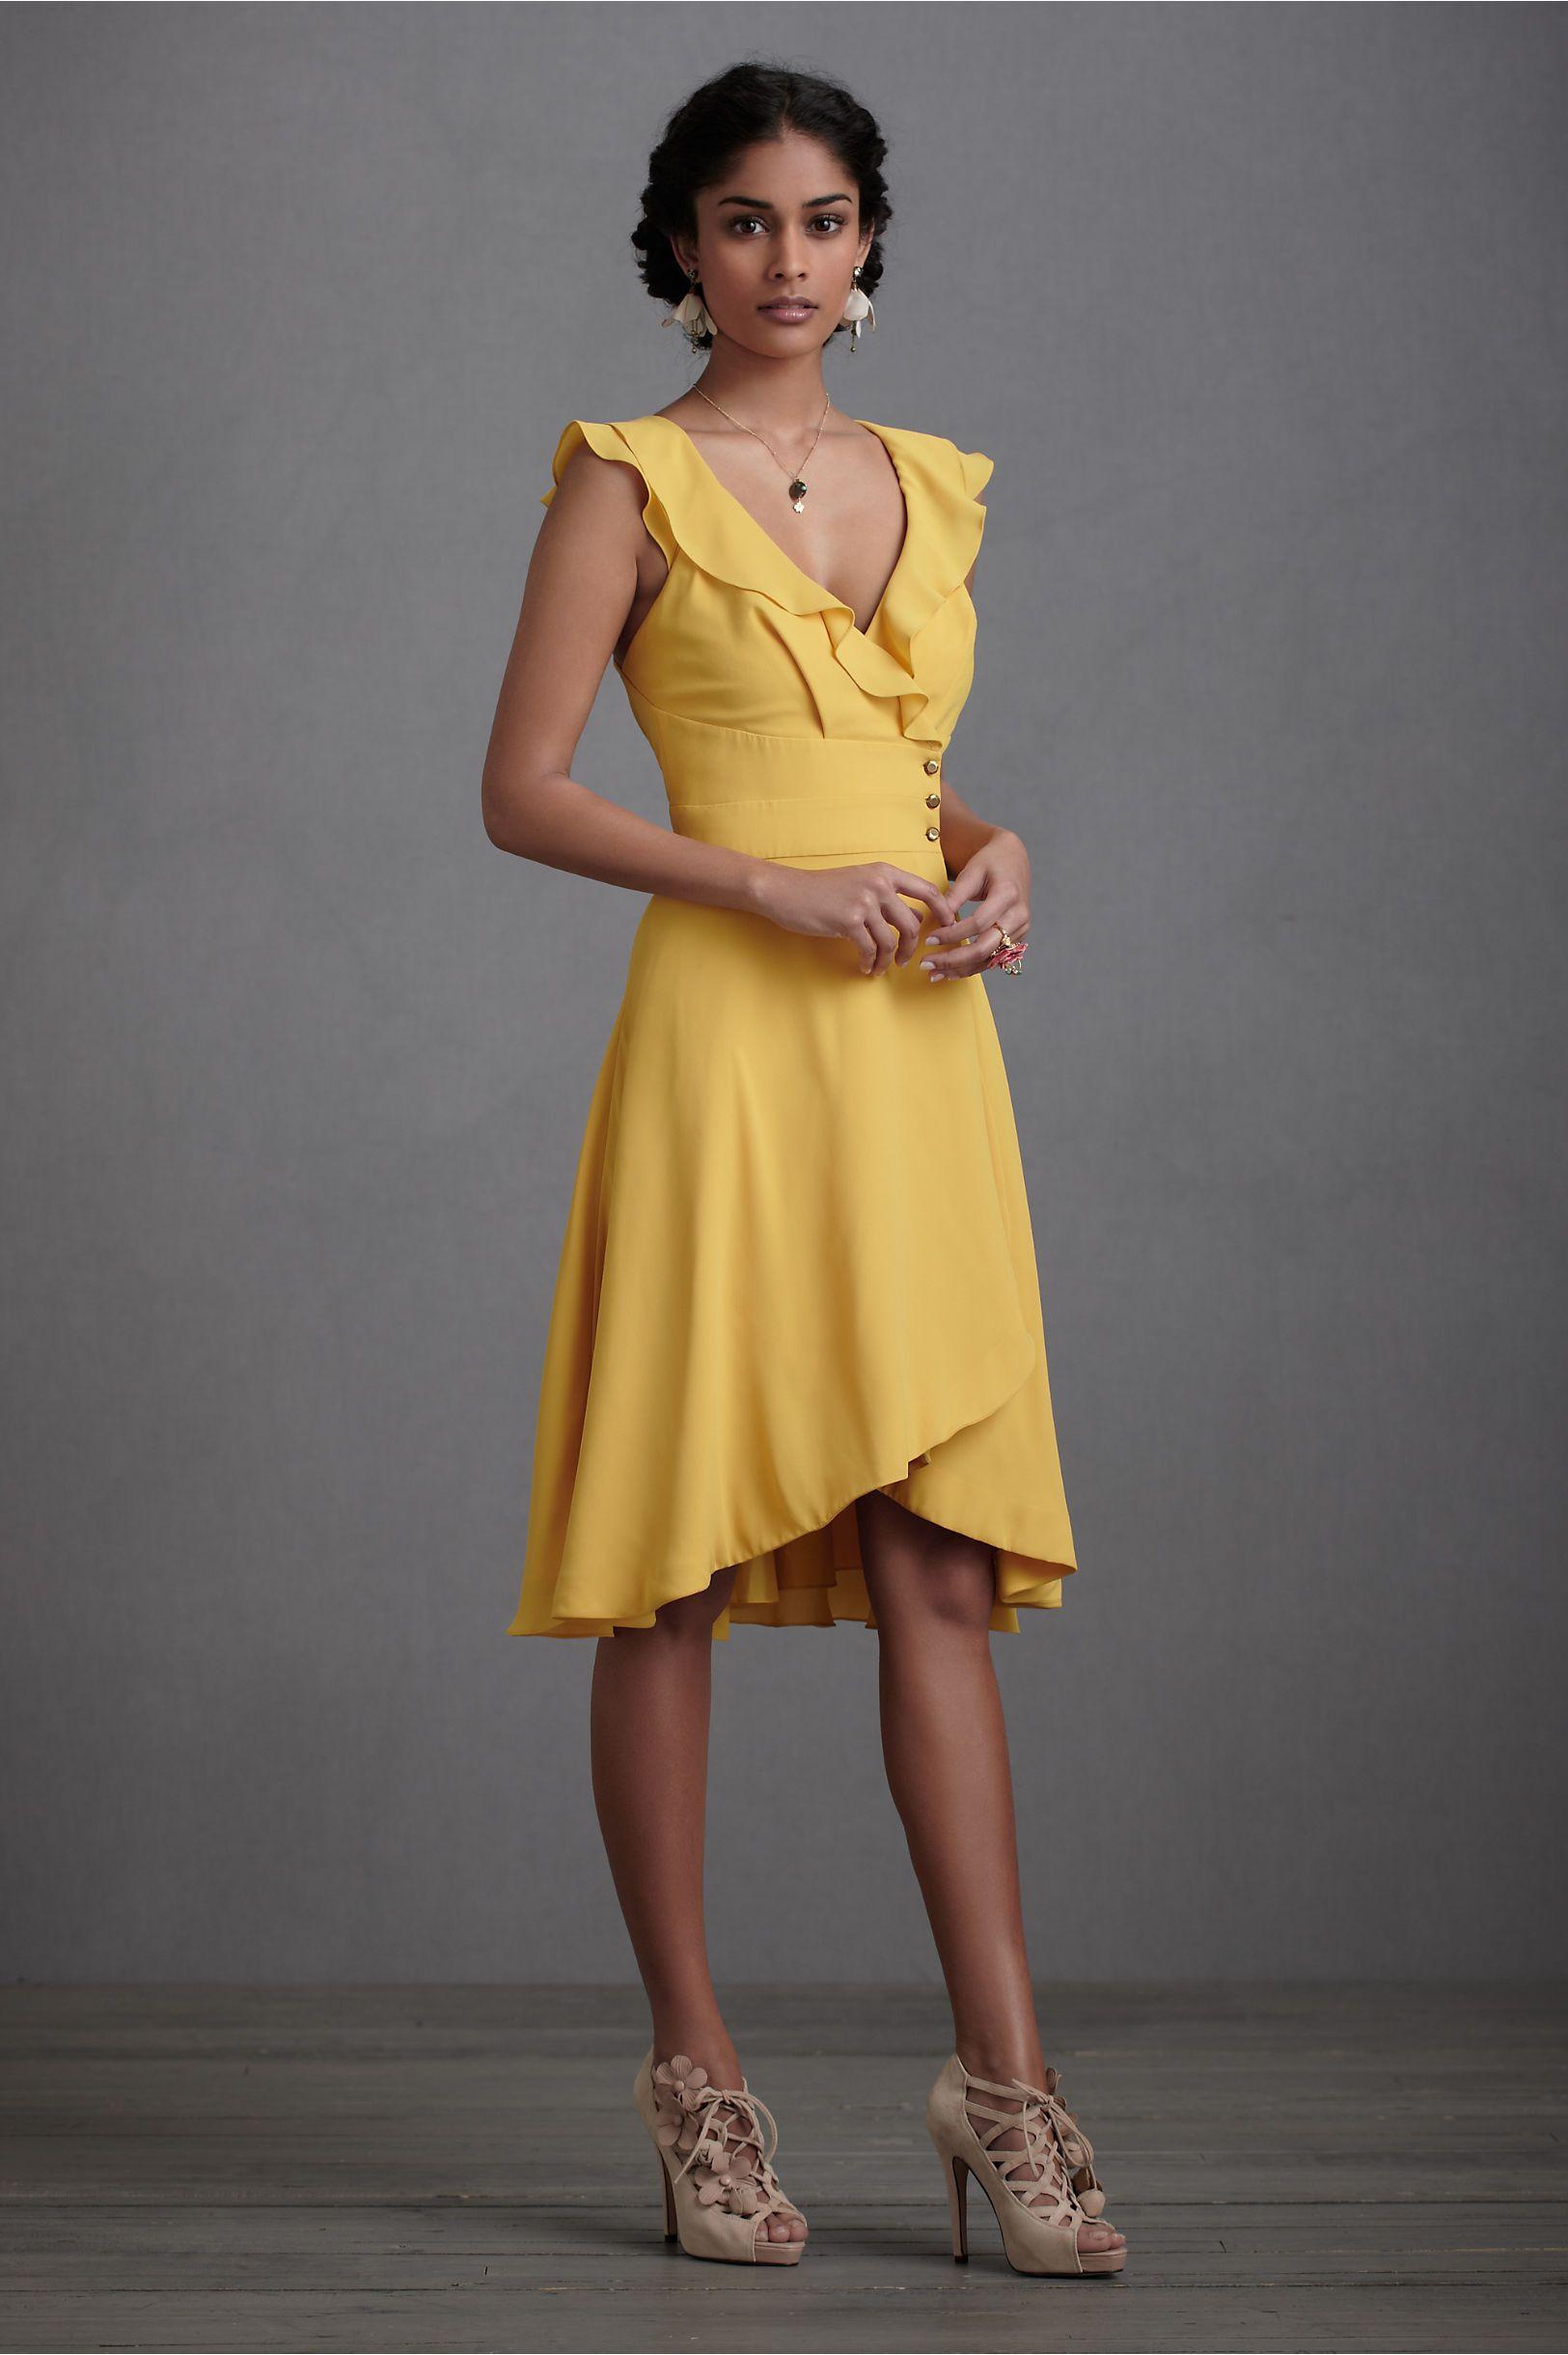 Macaron Color Clothing